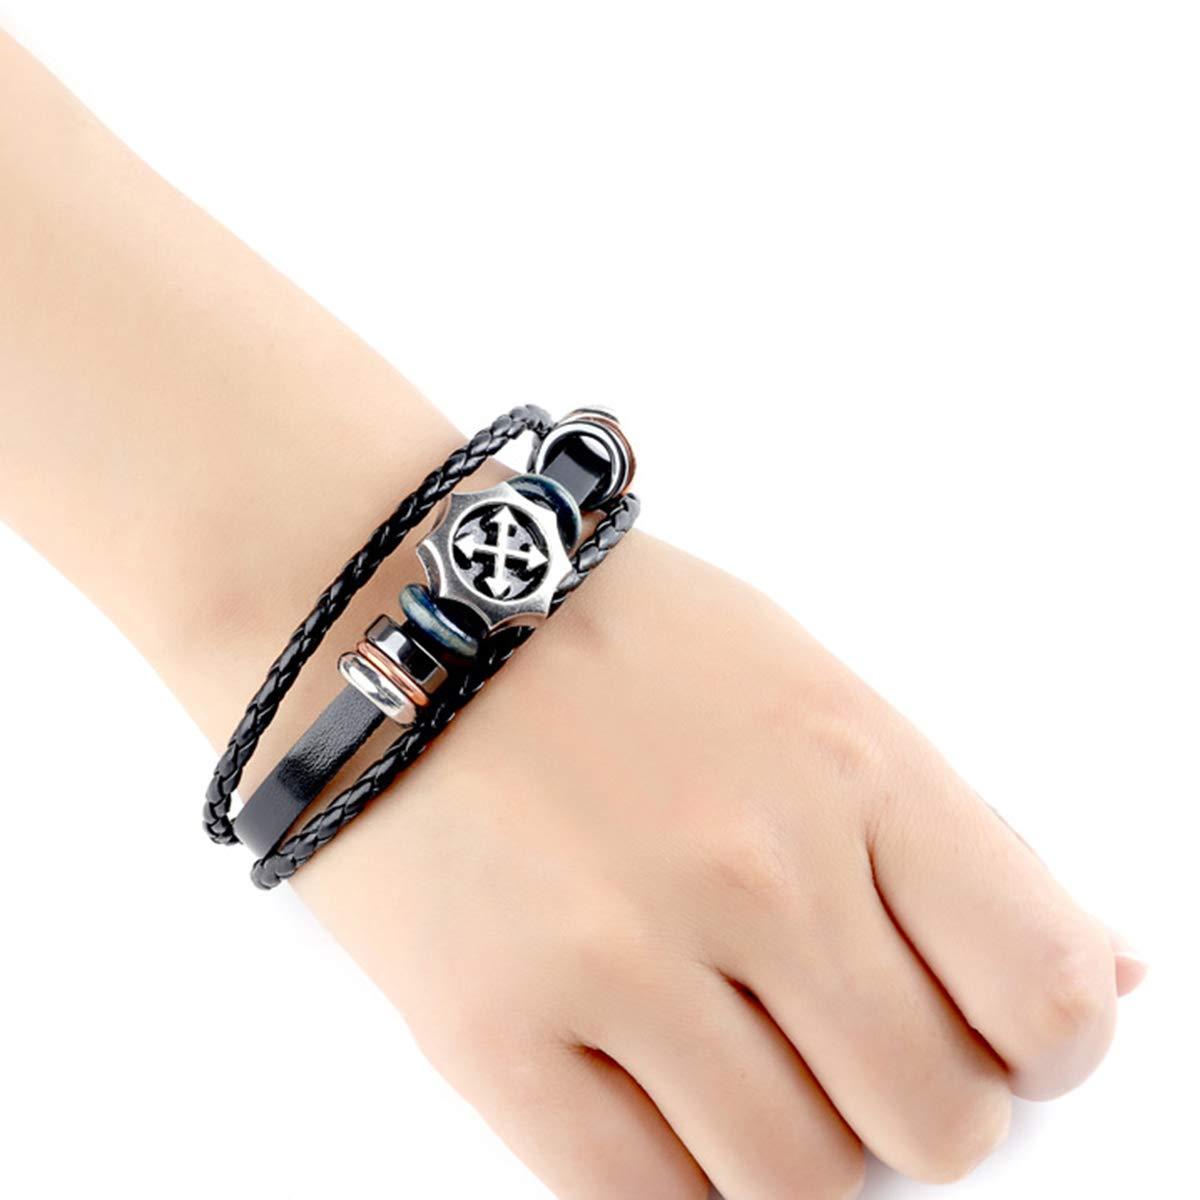 Helloriver Fashion Mens Bracelet Leather Handmade Decorative Bracelet Bracelet